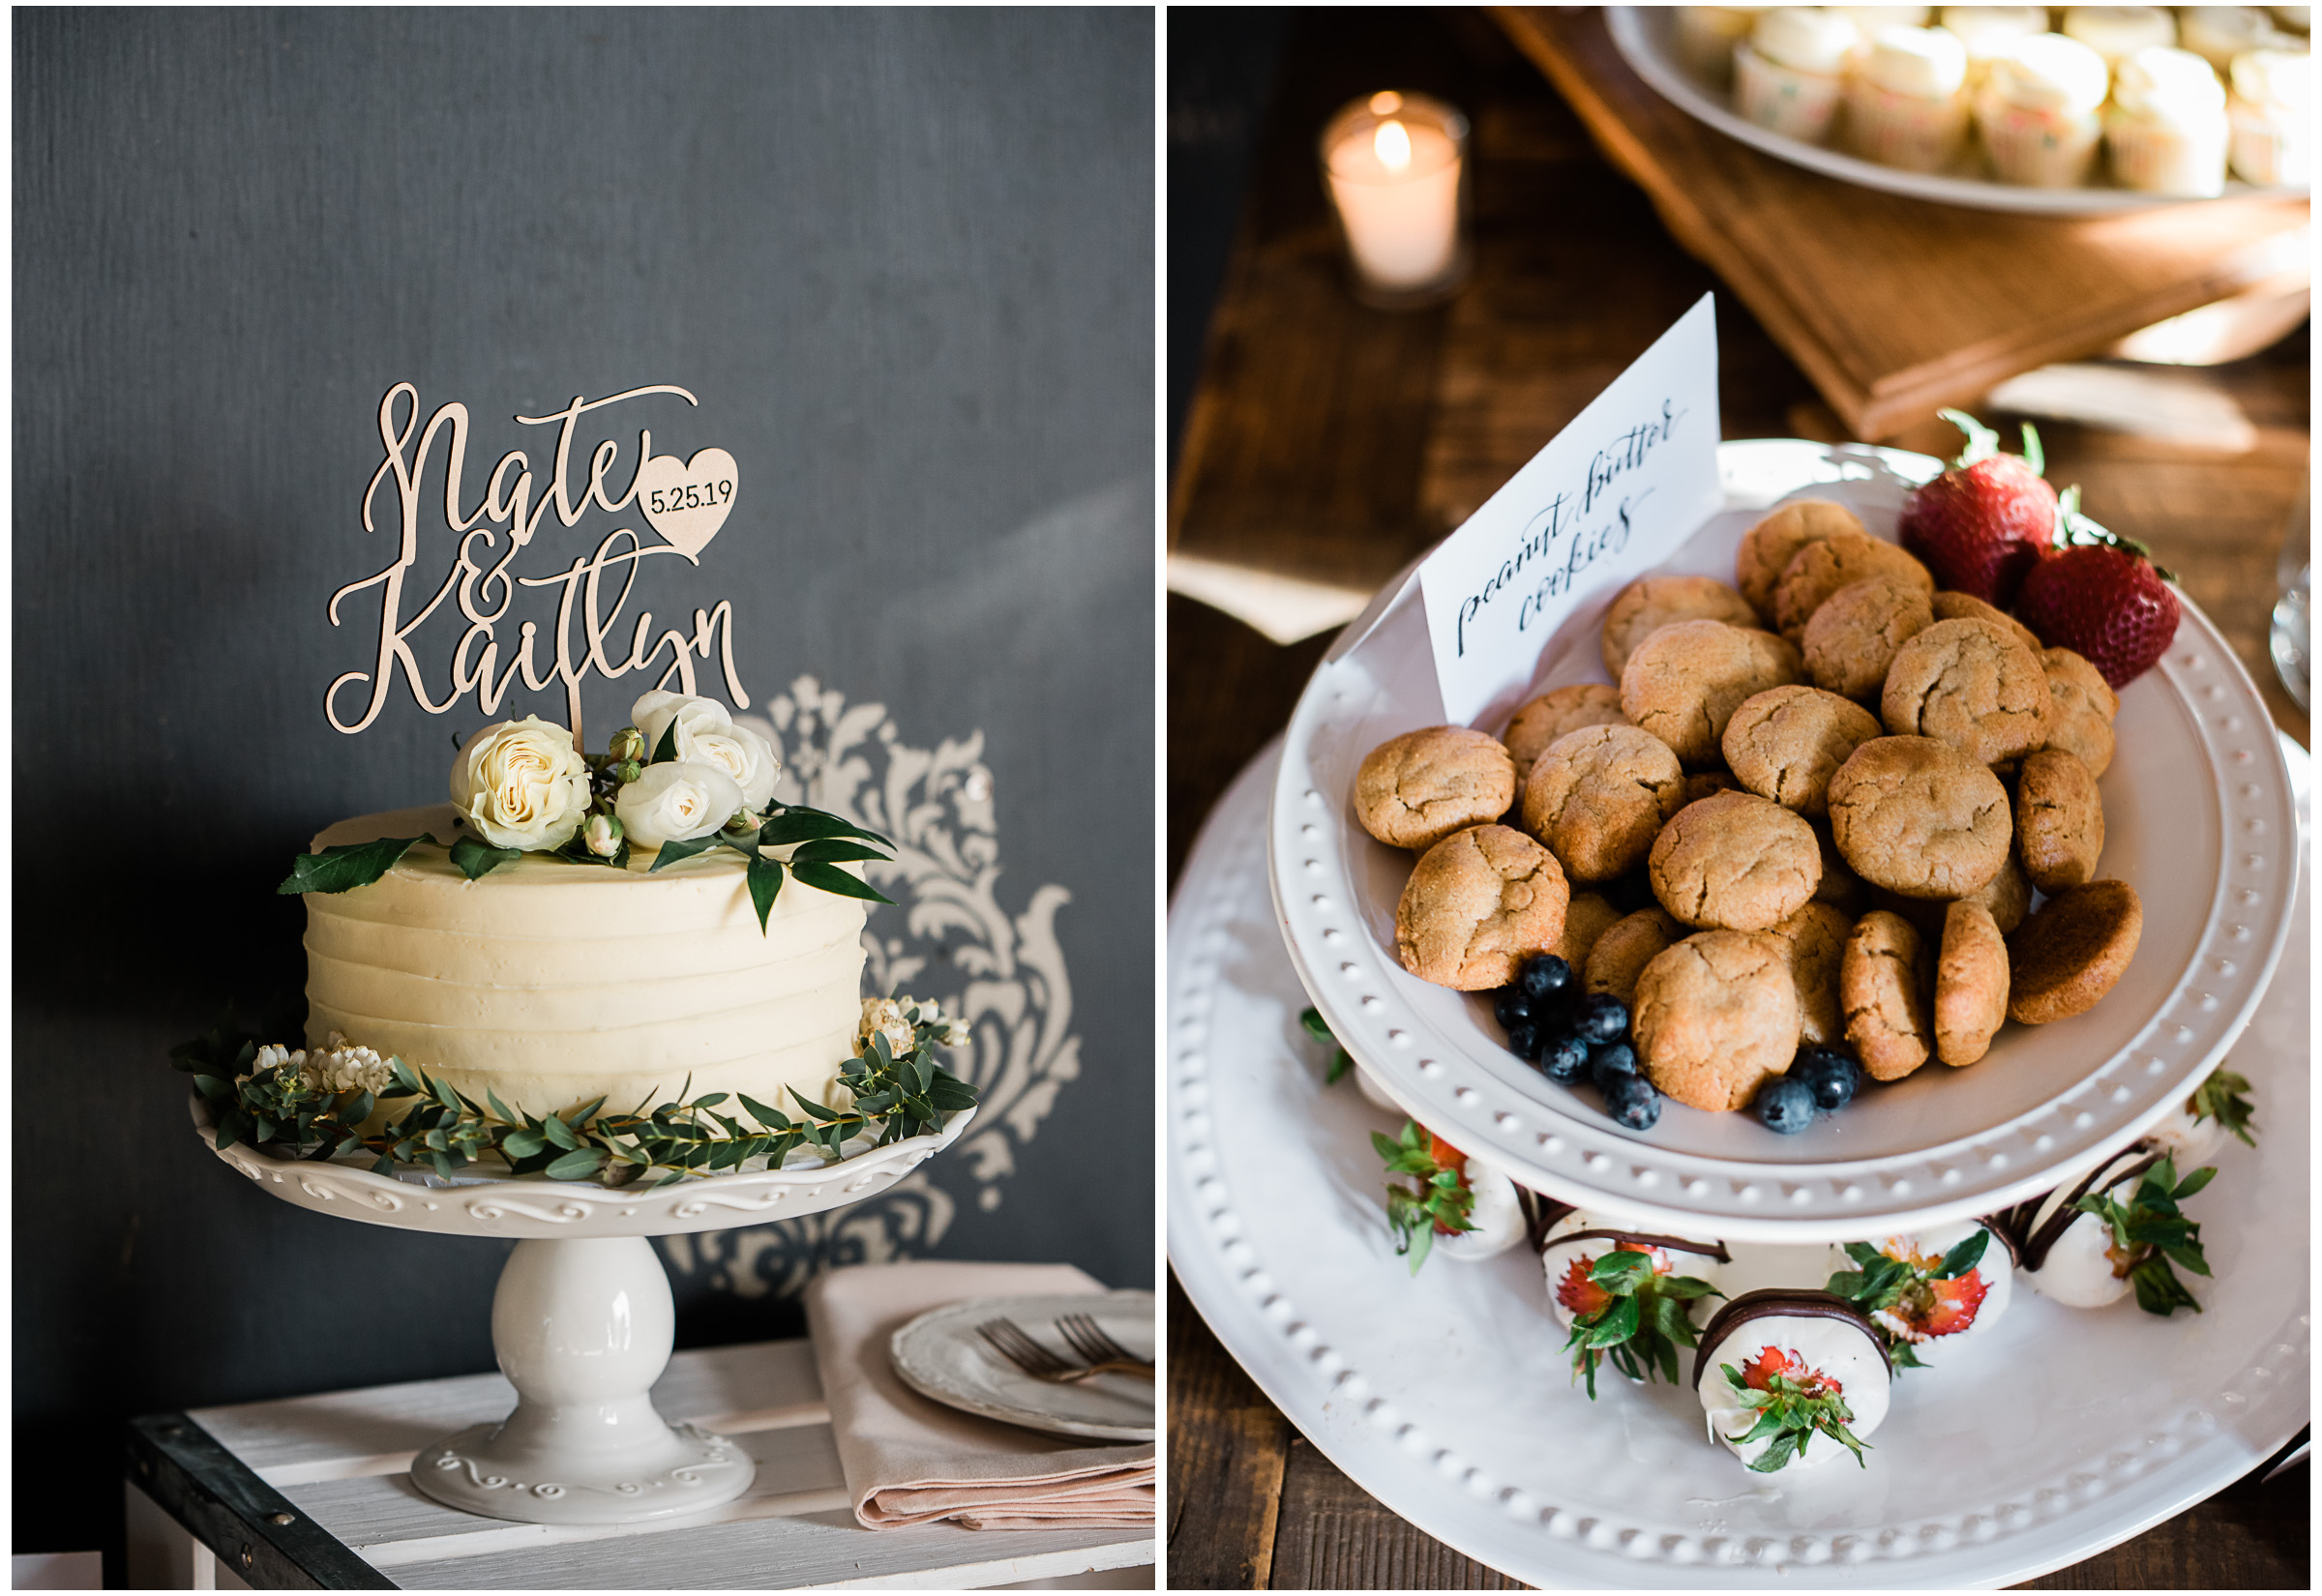 Winters Wedding - Sacramento Photographer - Field & Pond - Justin Wilcox Photography - 29.jpg